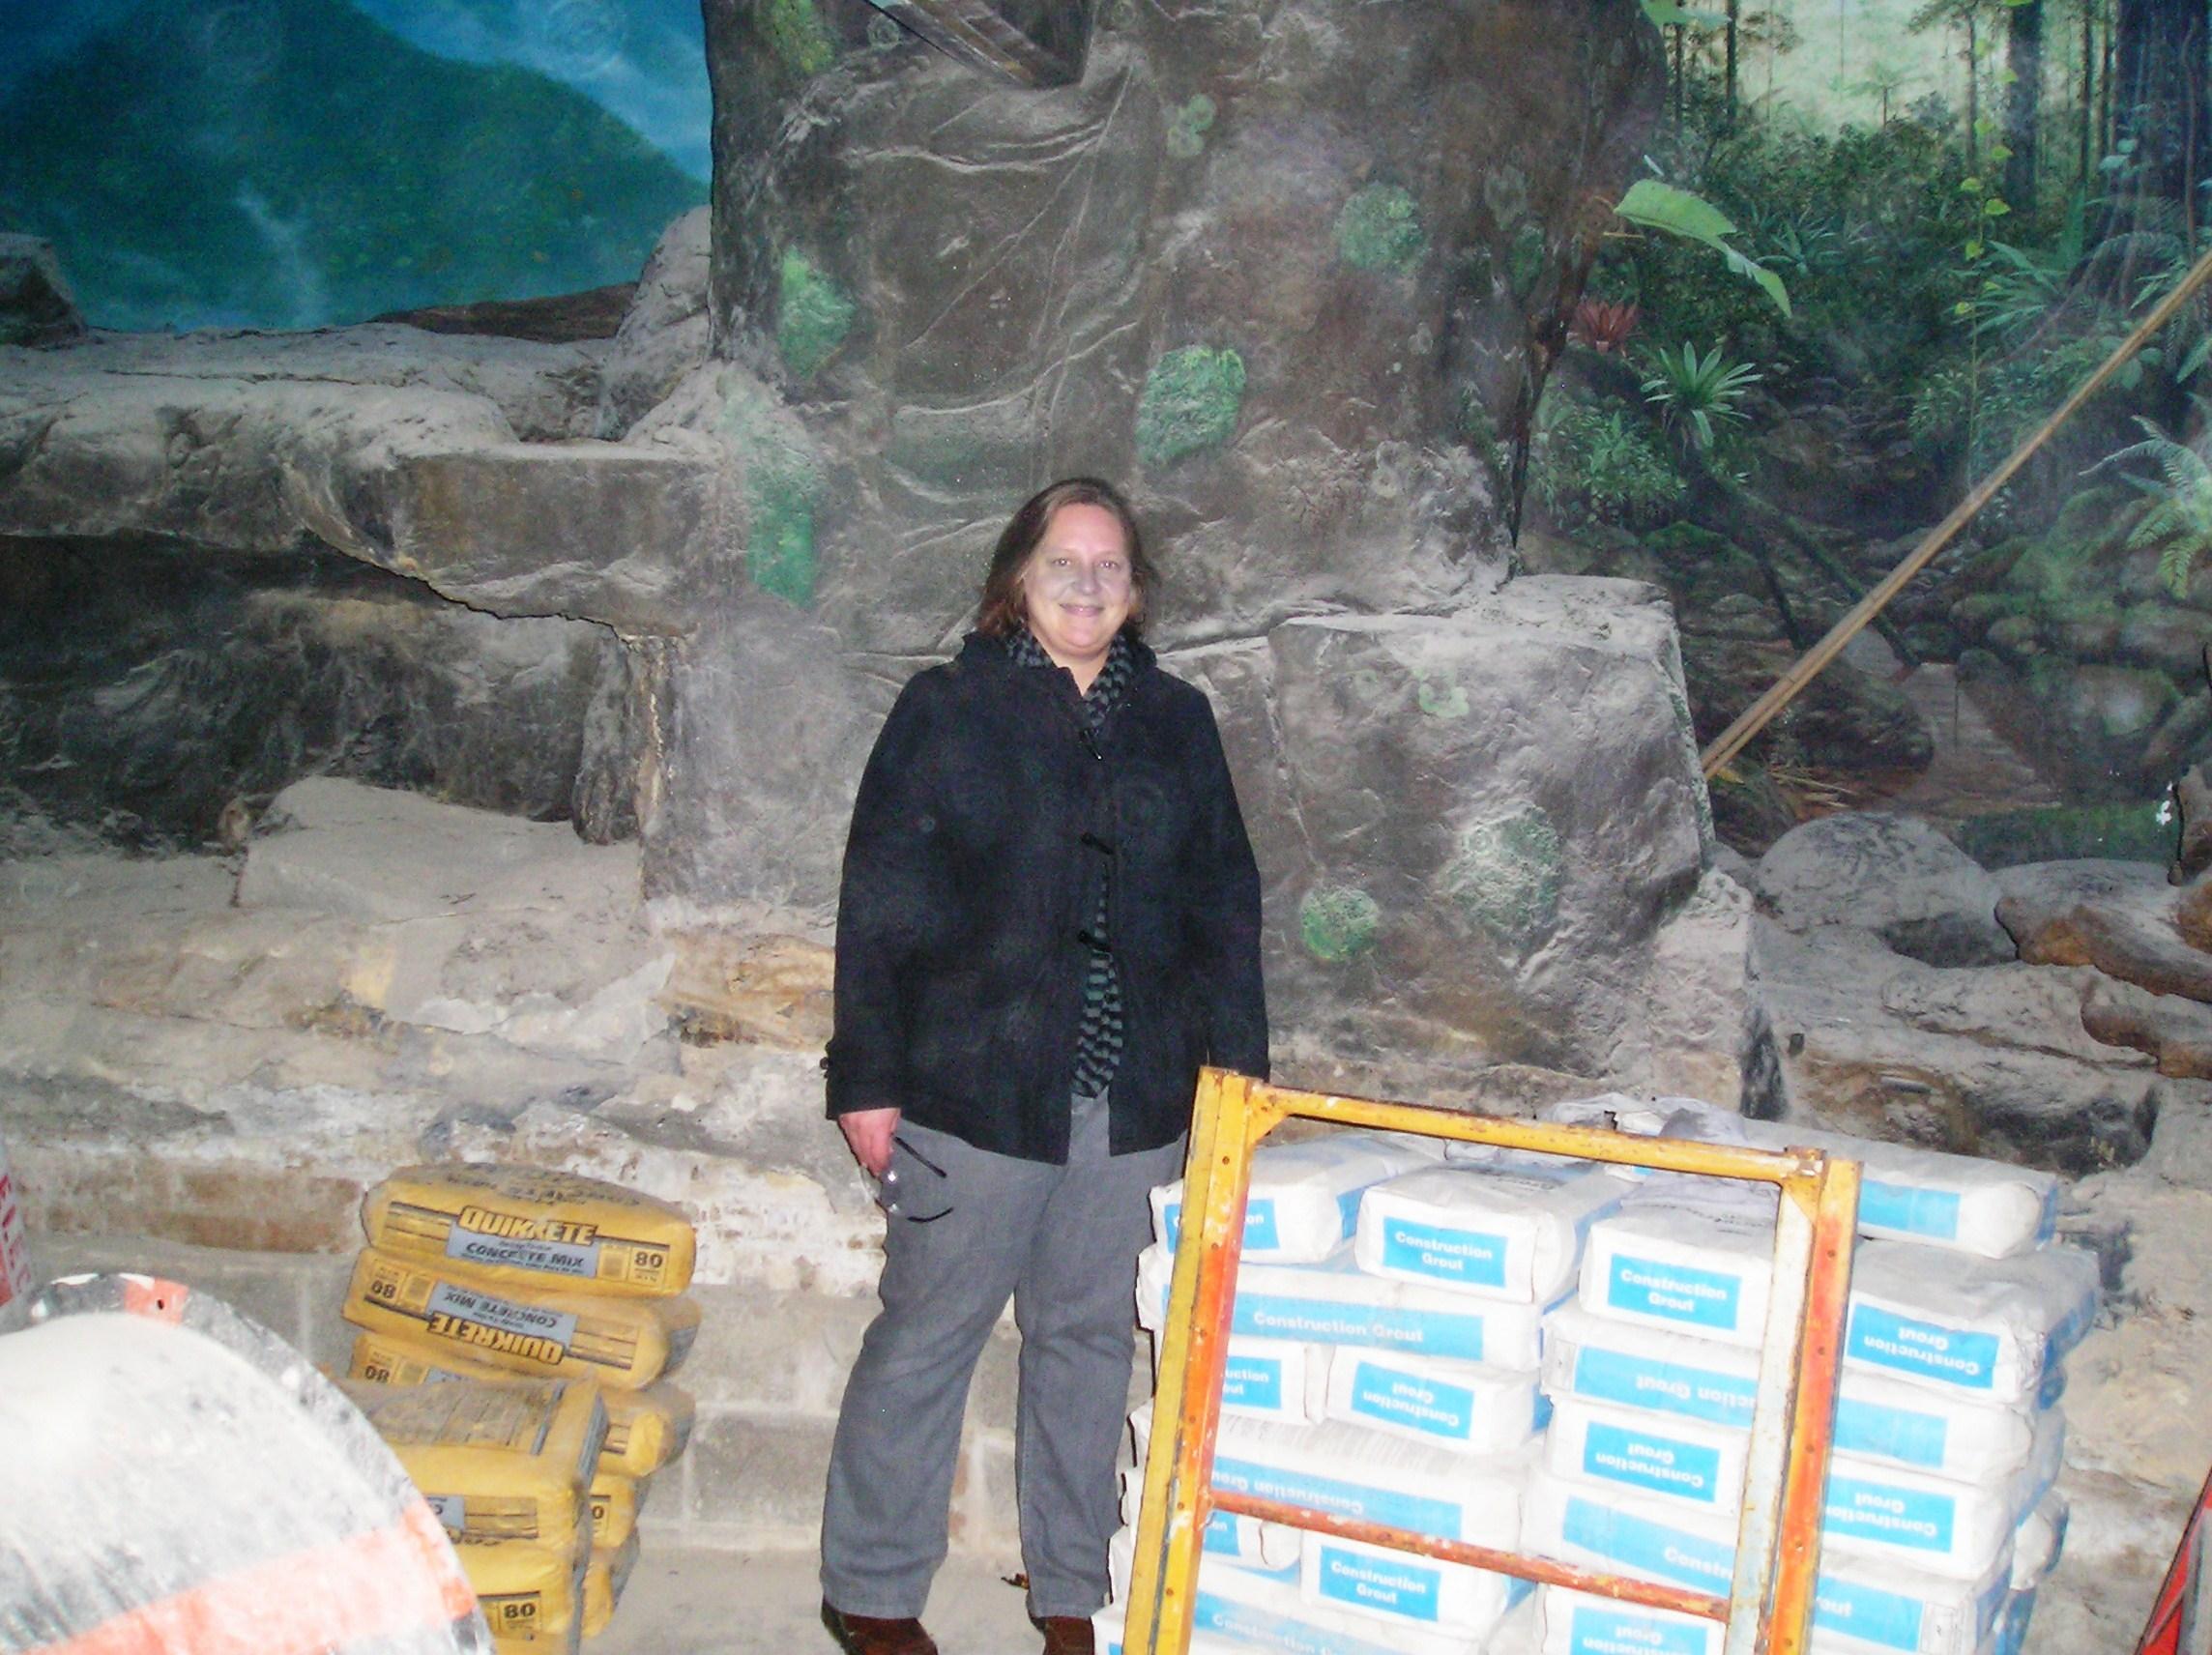 Night hunters under construction vi cincinnati zoo blog for Fishing in cincinnati